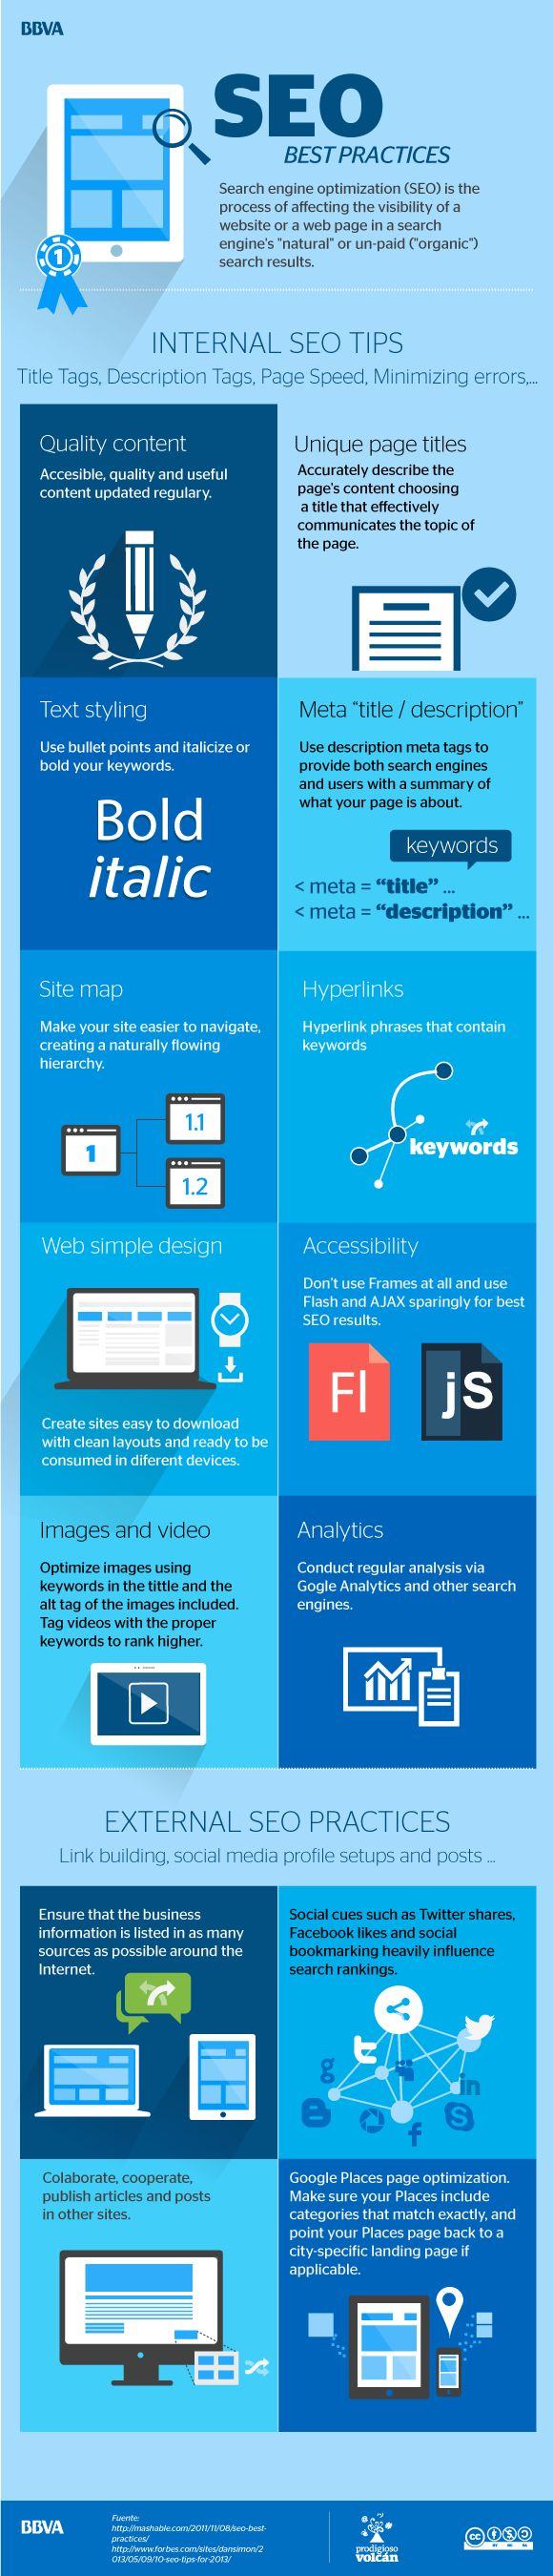 SEO best practices | BBVAOpen4u.com  #BBVAinfographics #BBVA #infographics #infografías #infografía #infographic #SEO #tecnología #tech #technology